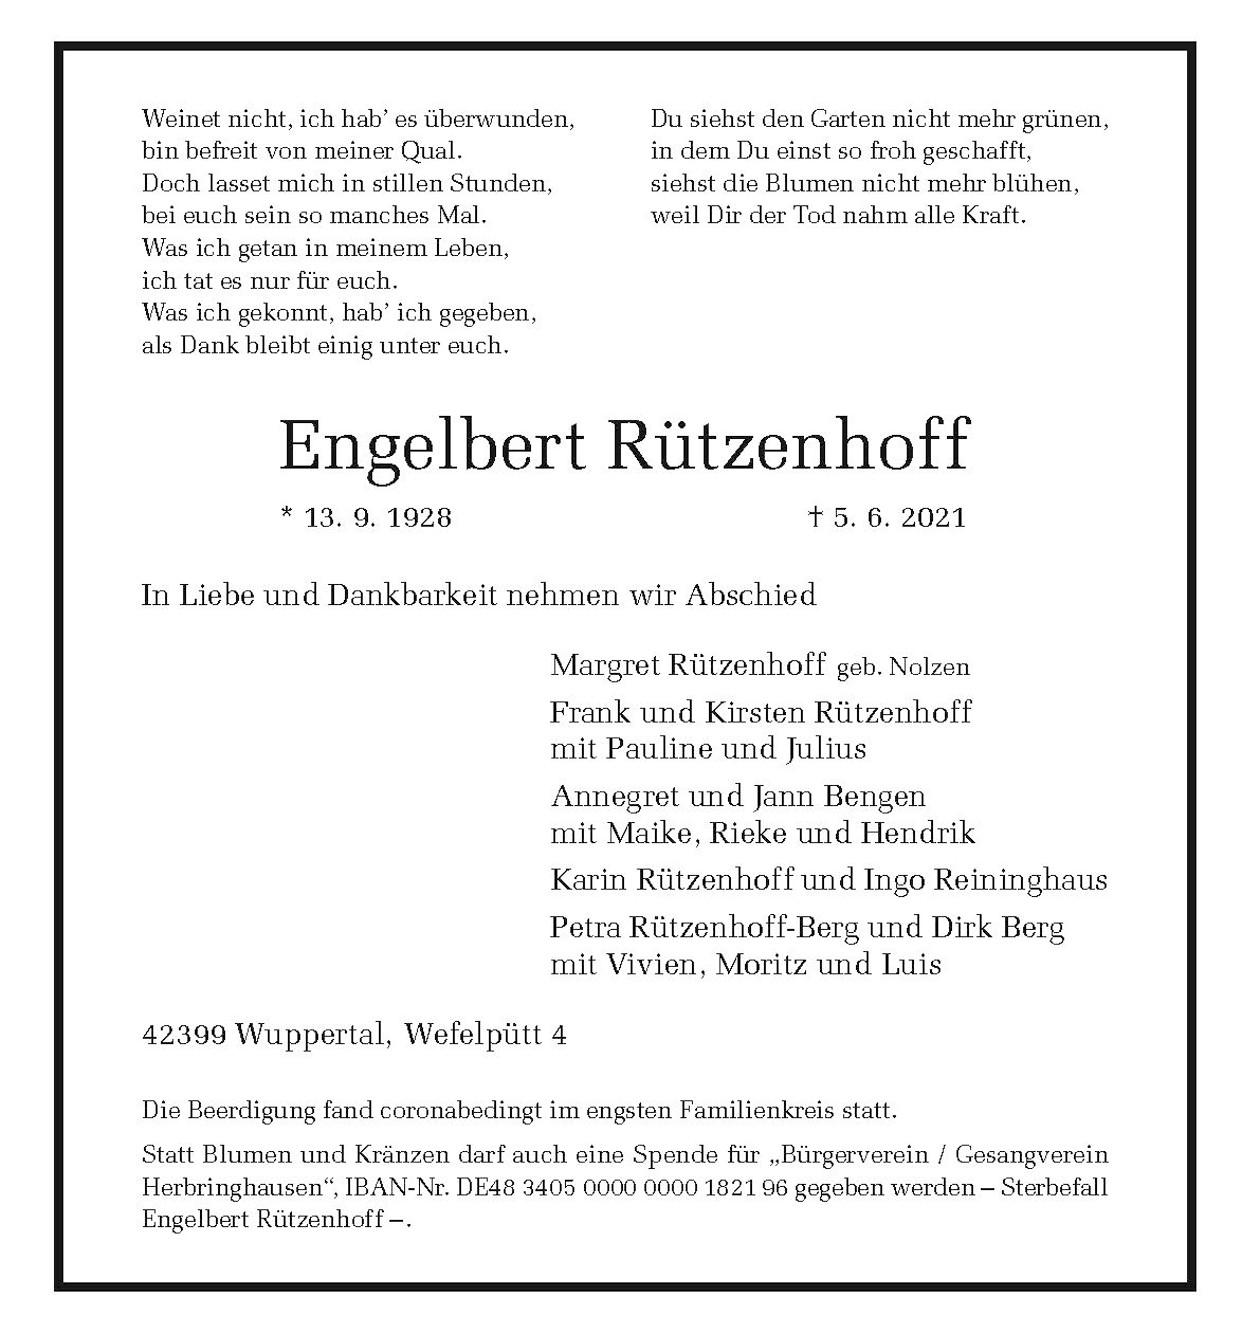 Engelbert Rützenhoff